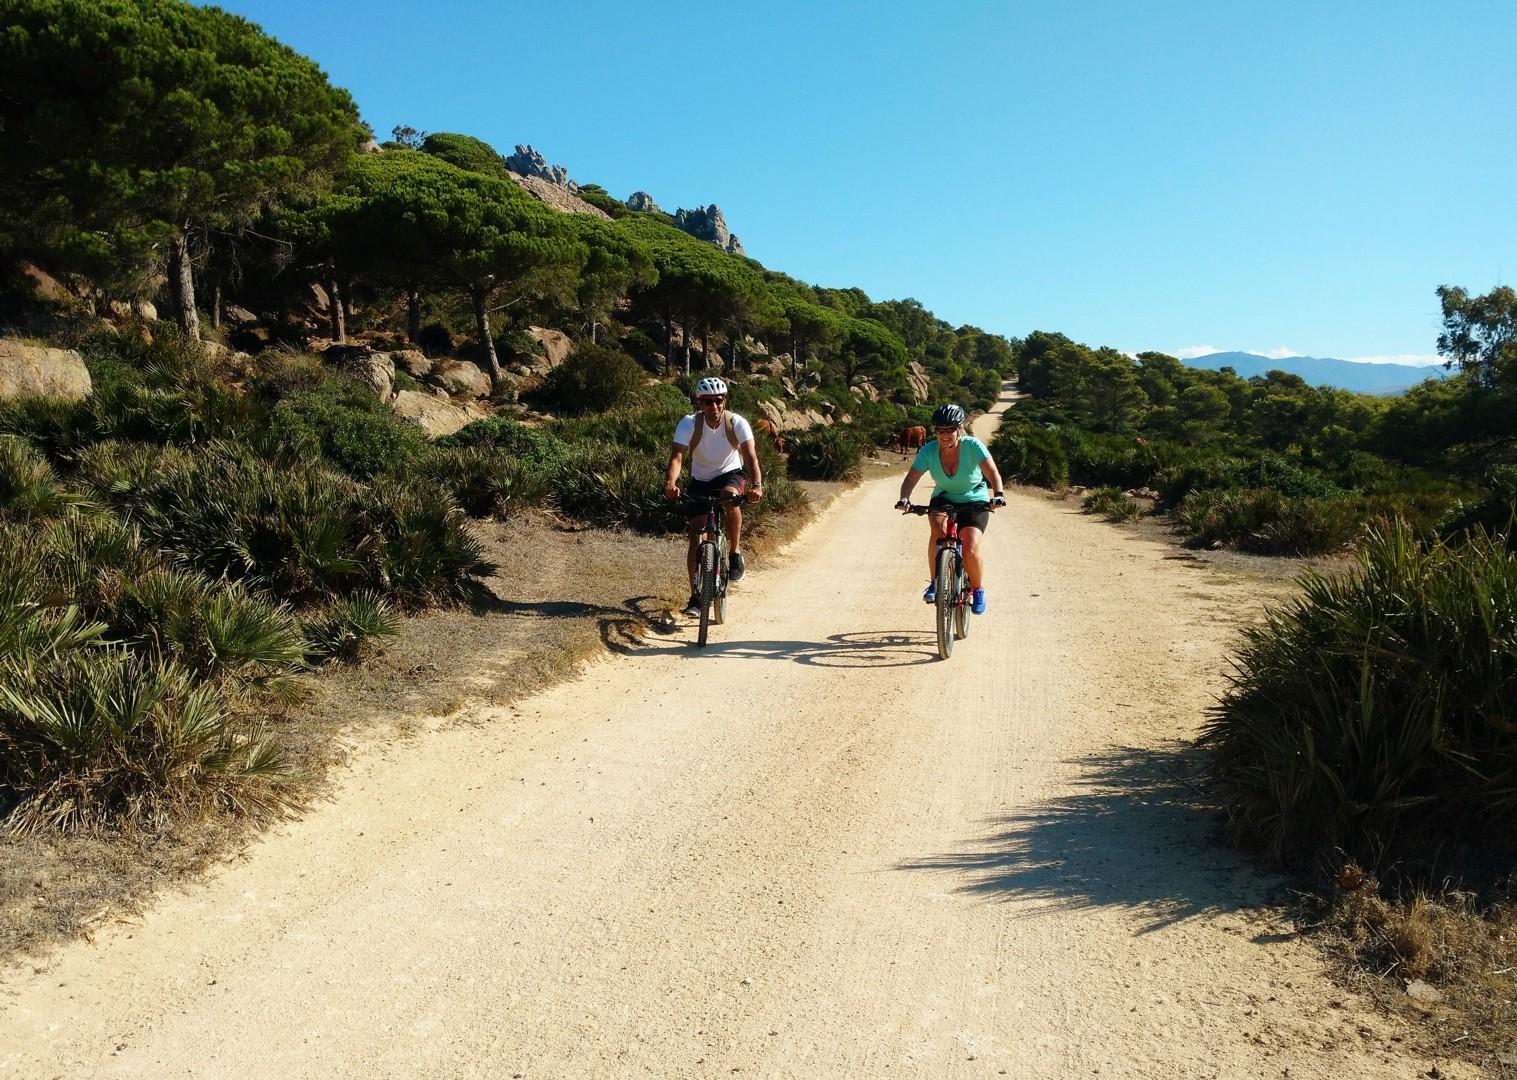 IMG_20171025_120159937.jpg - Southern Spain - Coastal Adventurer - Family Cycling